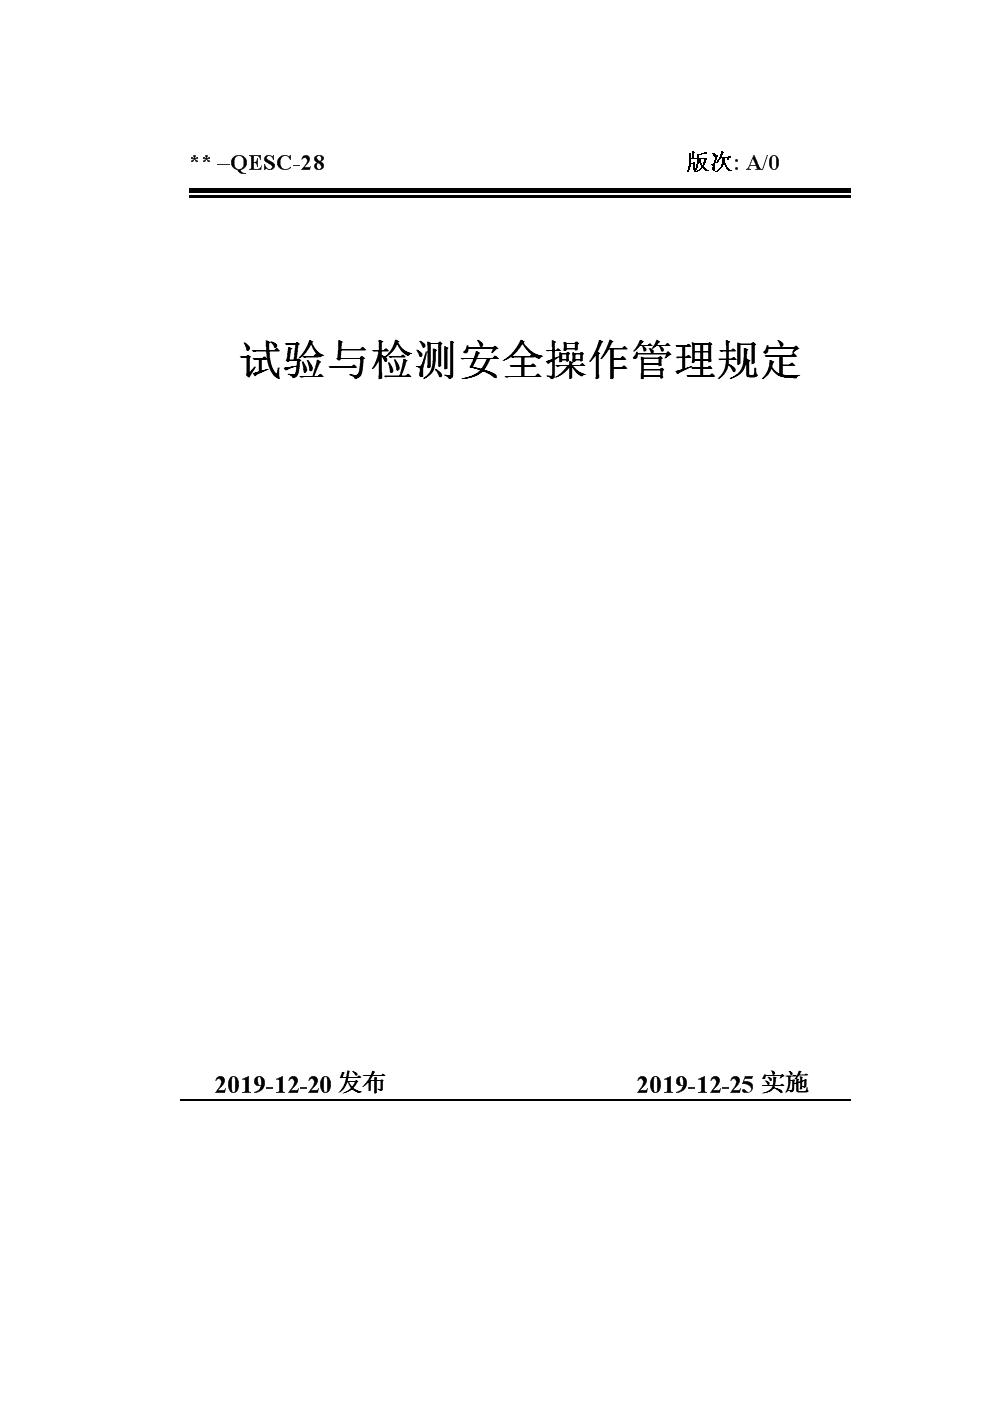 qesc-28试验与检测安全操作管理规定(EPC三标体系-作业文件)3-9.doc